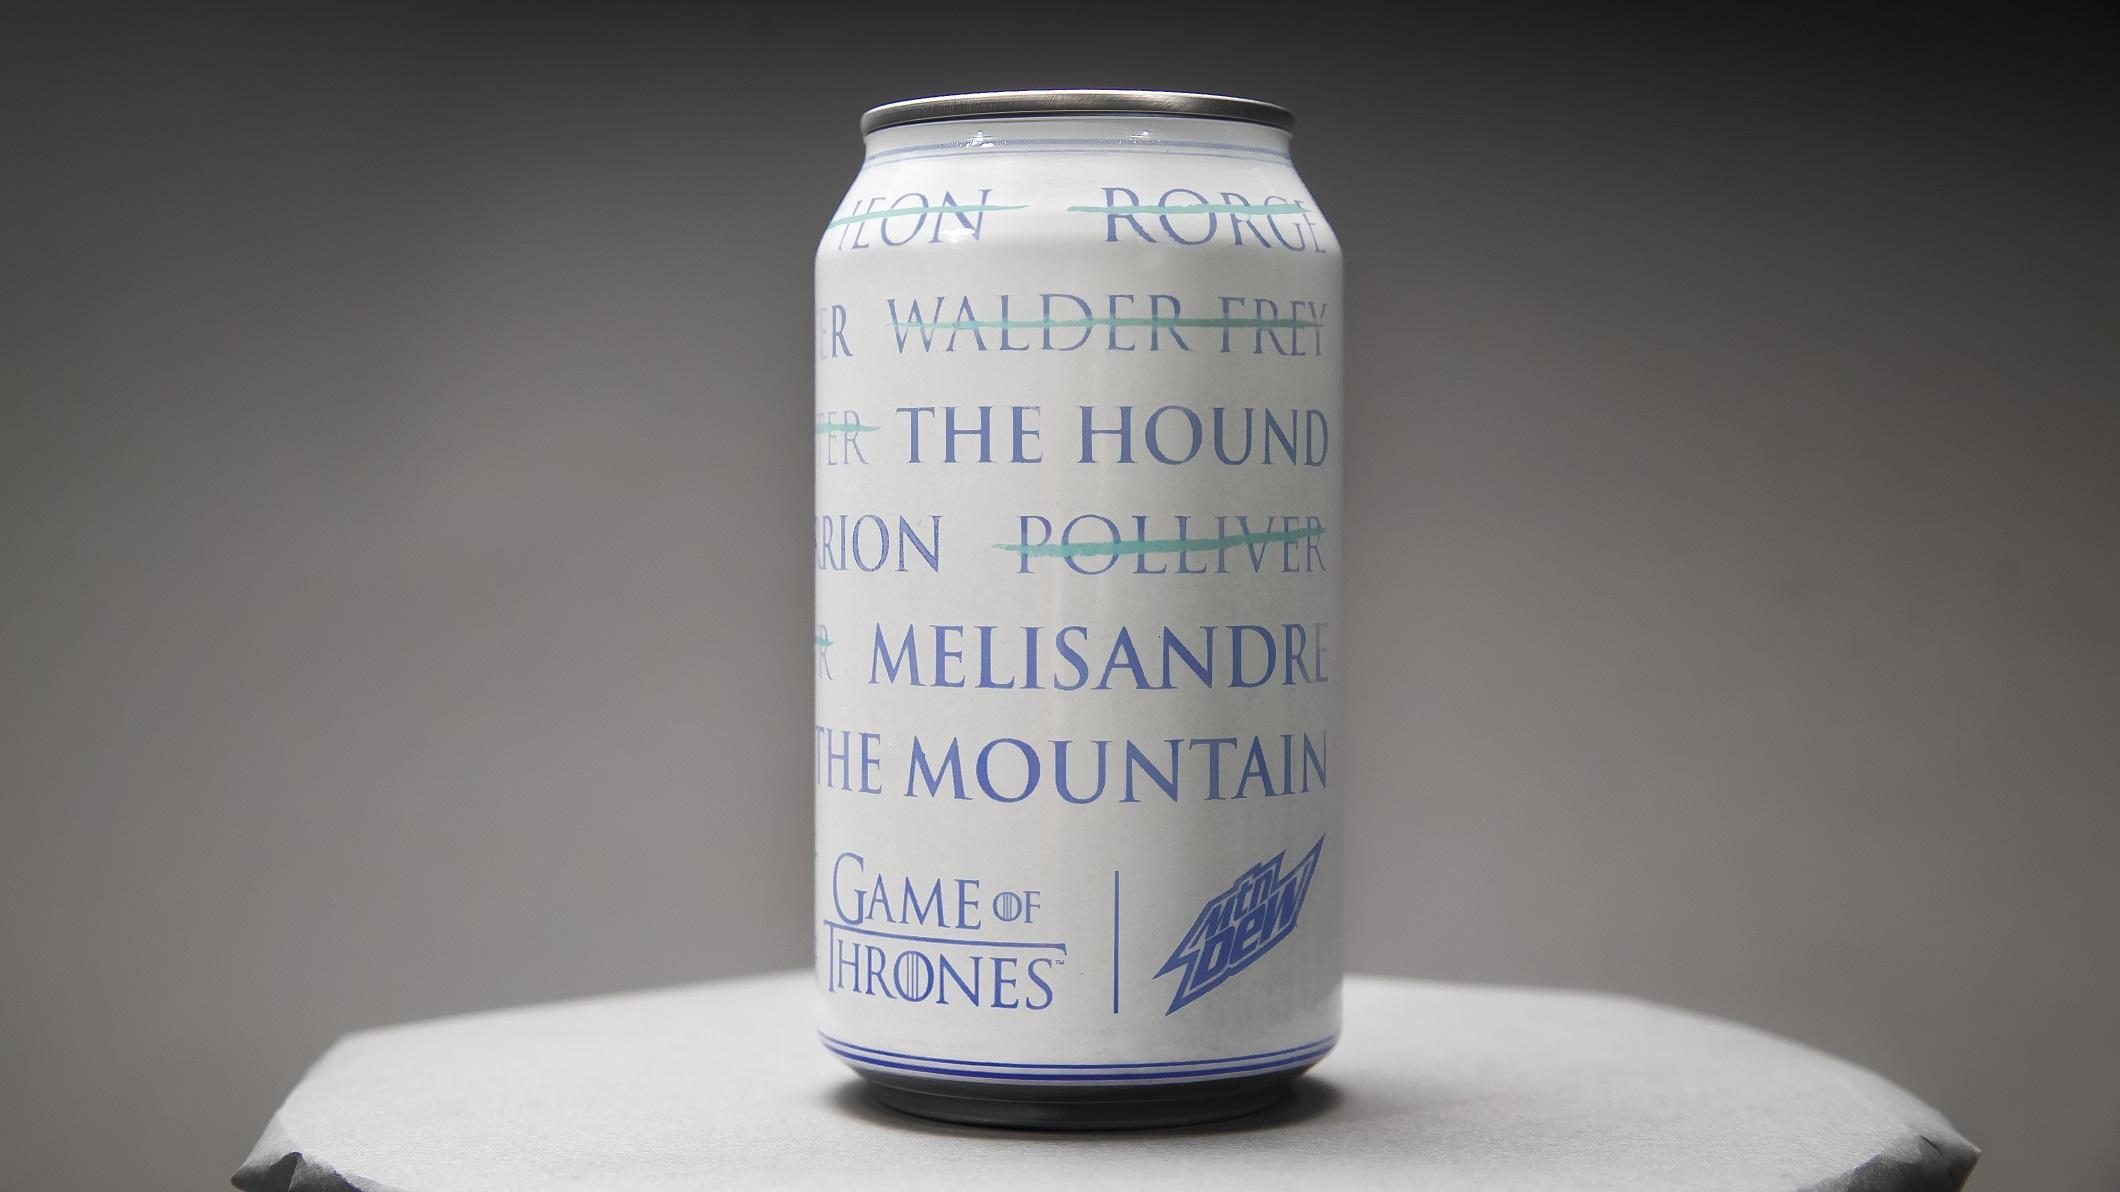 Mountain Dew For The Throne Can Season 8 Arya List